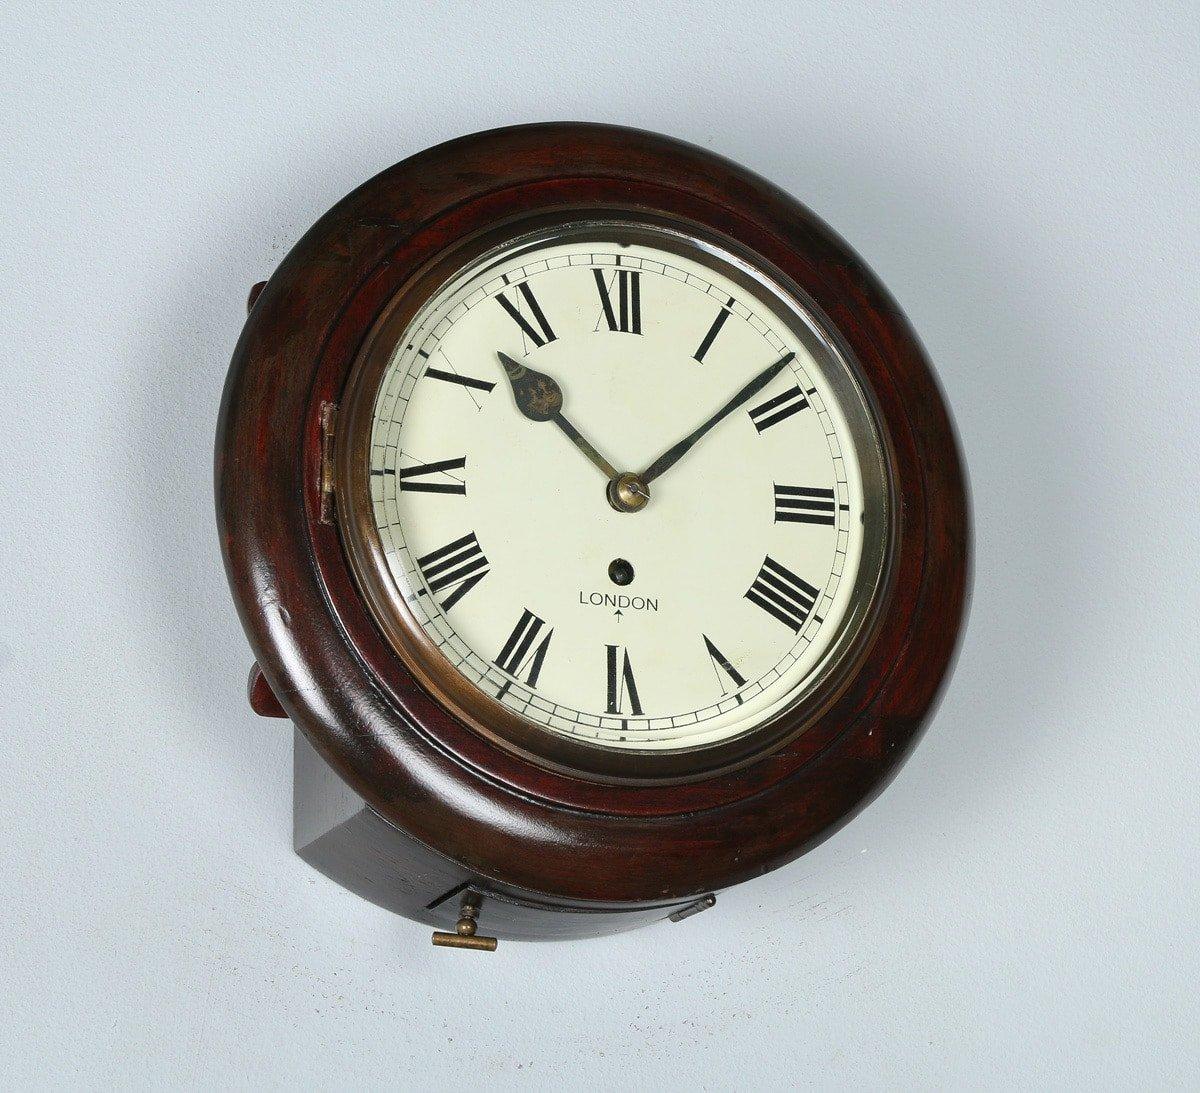 Victorian style 11 mahogany fusee railway station school wall clock english victorian 11 mahogany london fusee round dial wall clock time piece circa 1890 amipublicfo Gallery